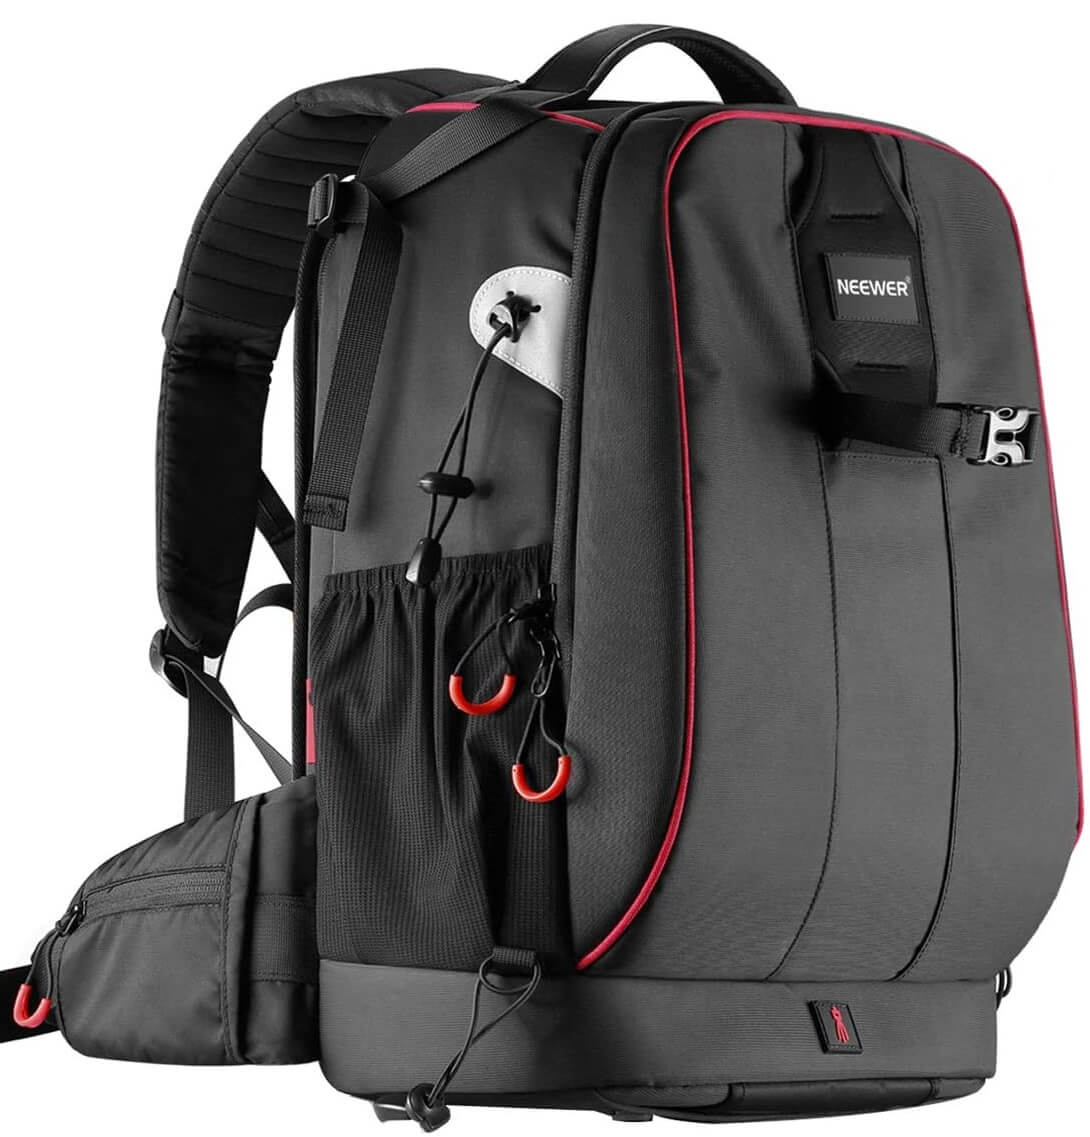 Neewer DJI Phantom 3 Backpacks